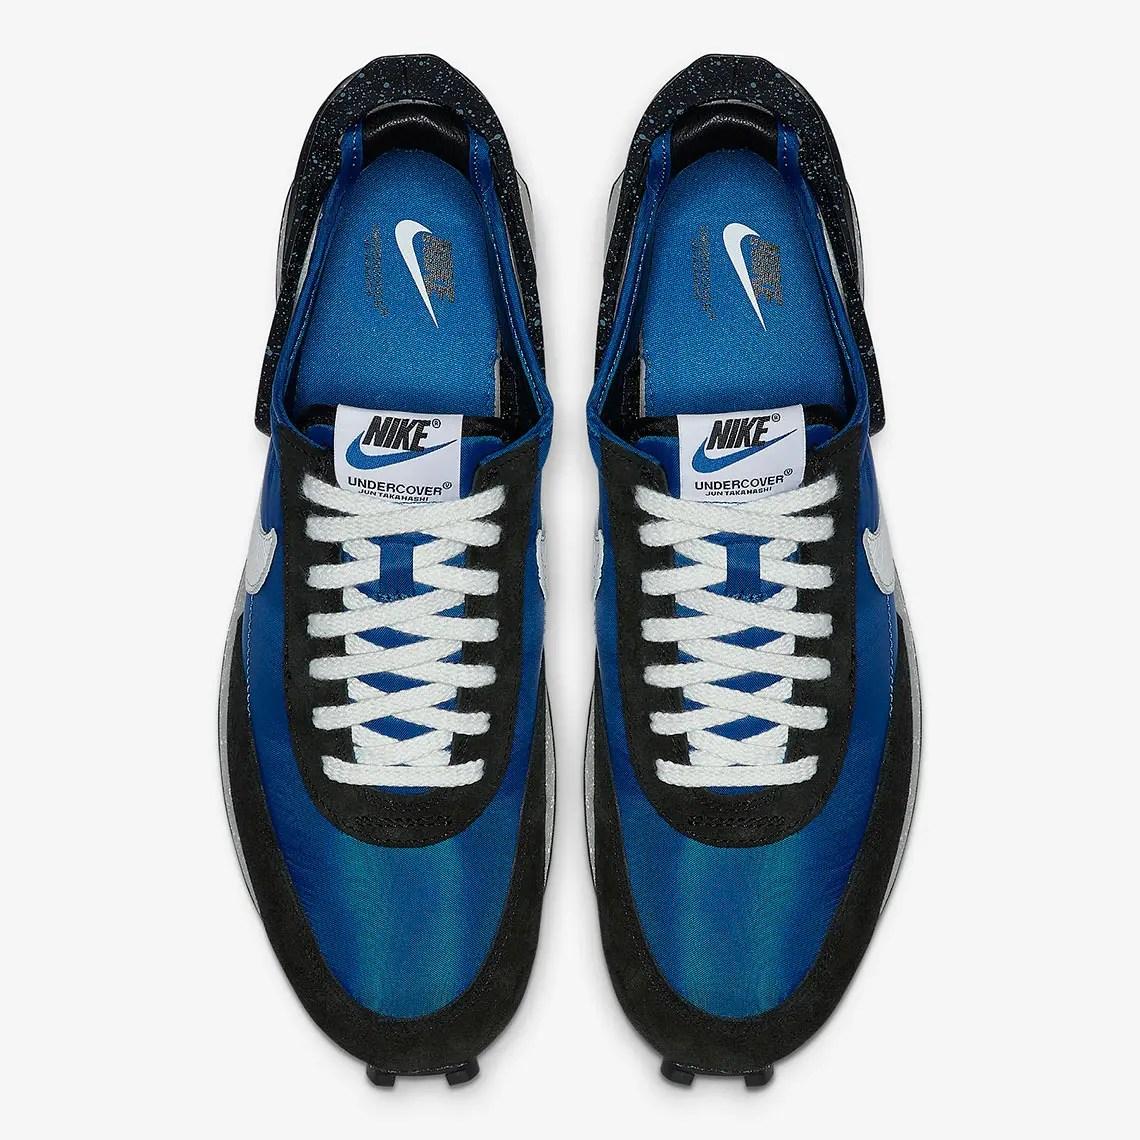 UNDERCOVER-Nike-Daybreak-Blue-BV4594_400-3